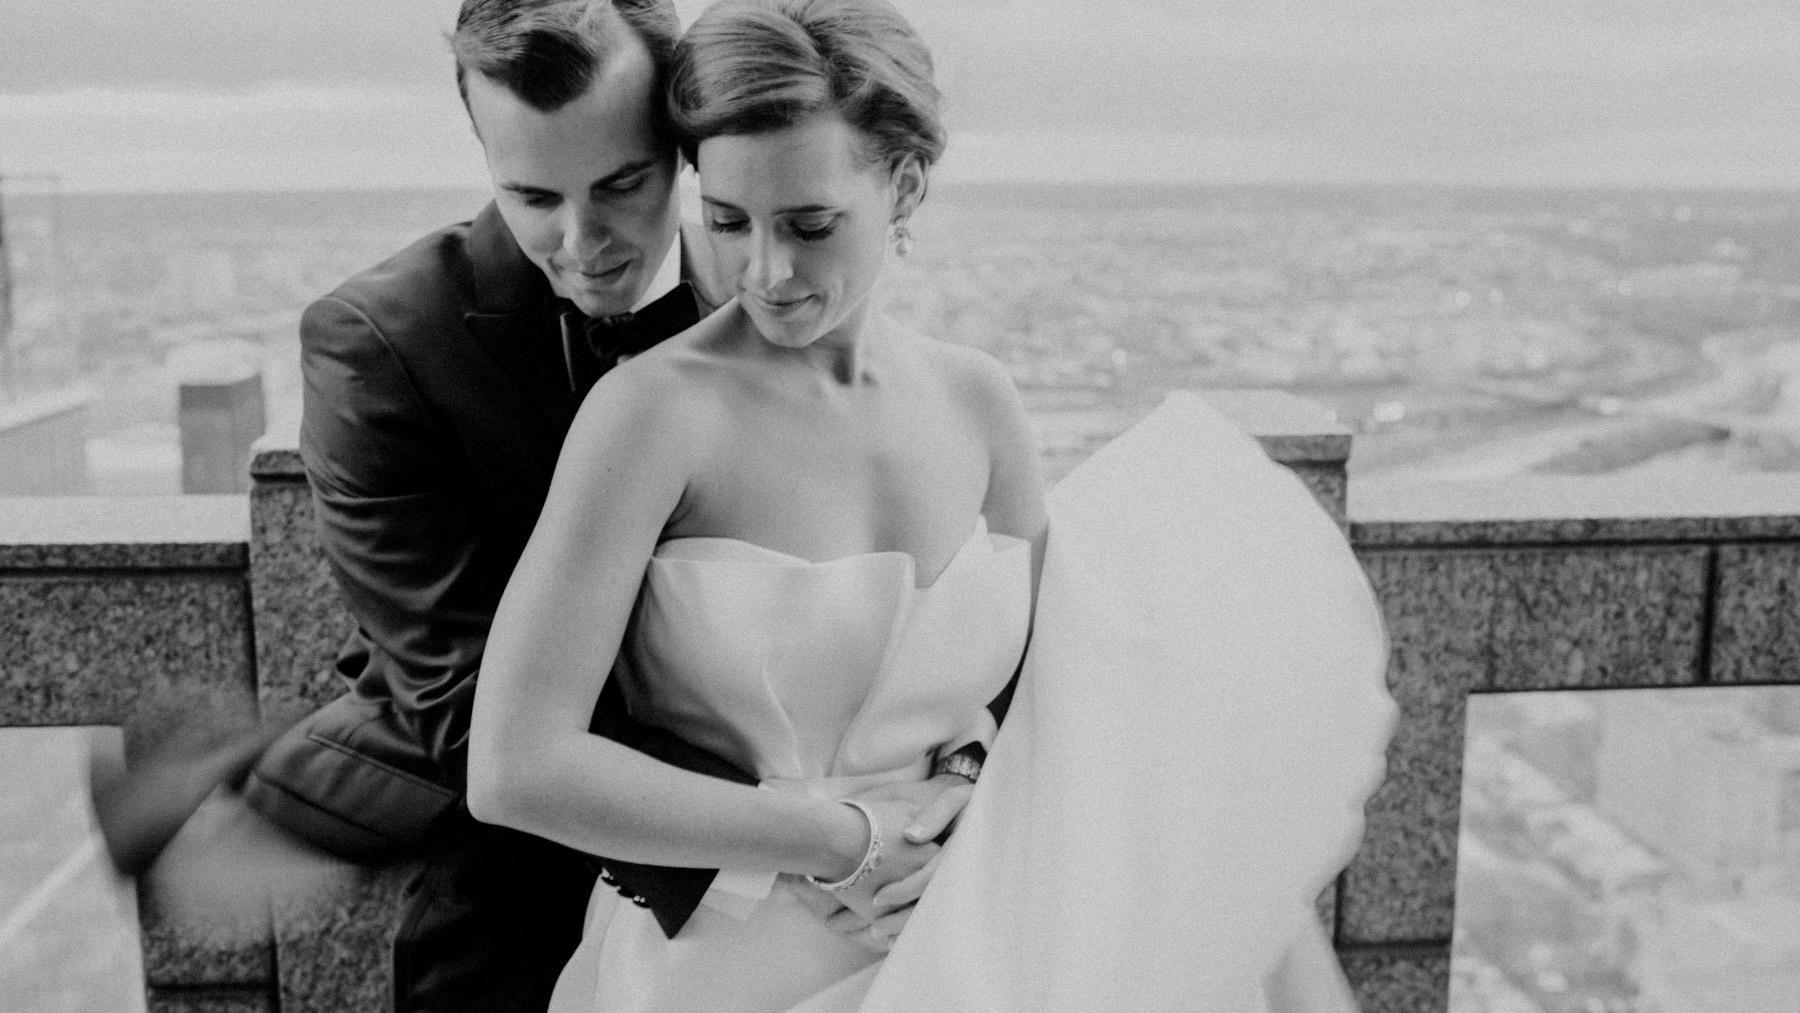 033-top-of-the-tower-wedding-9.jpg